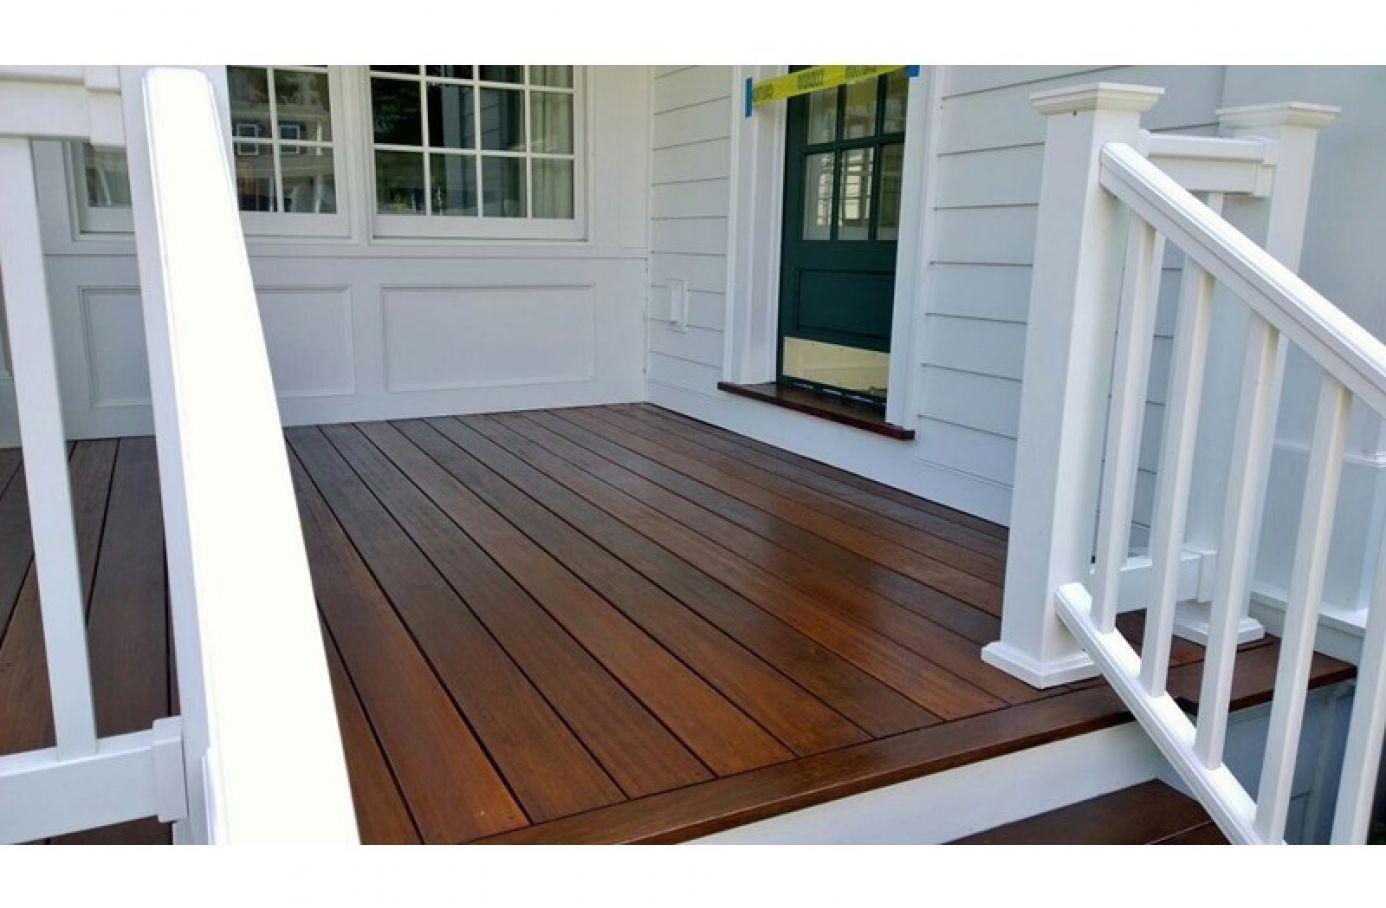 Pressure Treated Pine Deck With Dark Oak Tone Sealer Staining